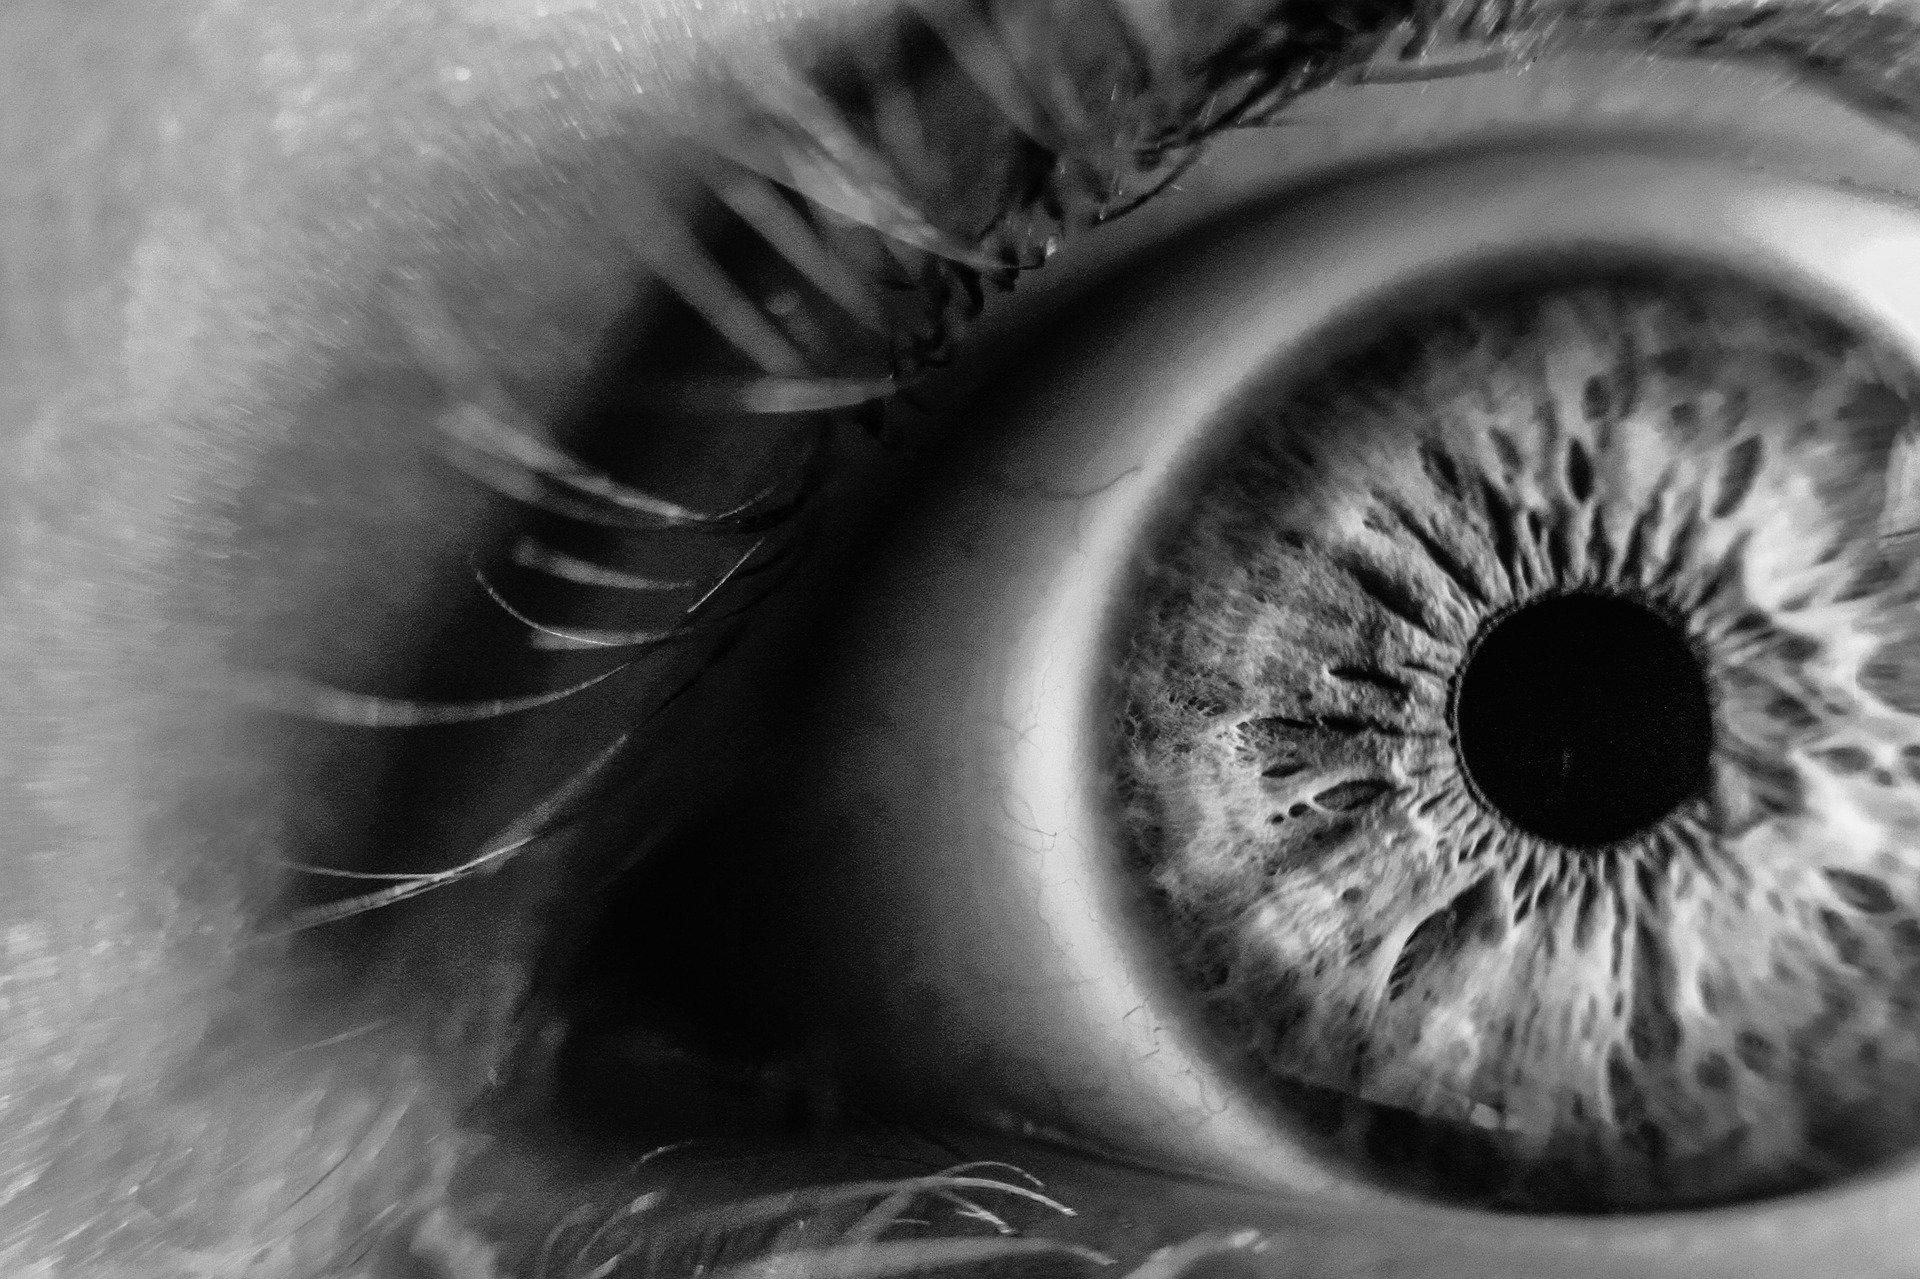 "Безплатни прегледи за влажна дегенерация на макулата организира Клиниката по очни болести на УМБАЛ ""Свети Георги"""